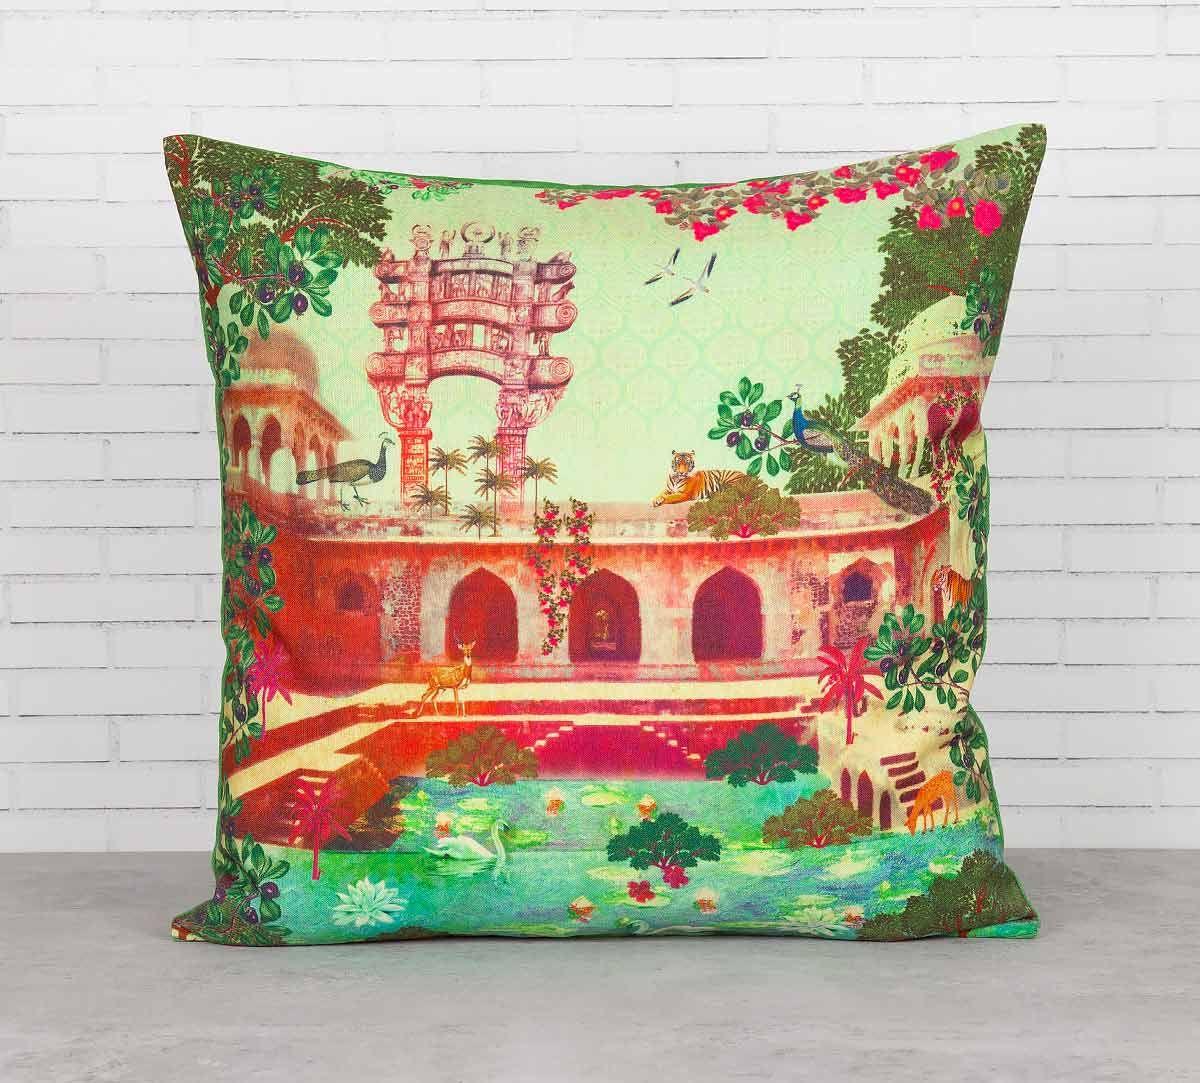 India Circus Mammalian Picnic Cushion Cover